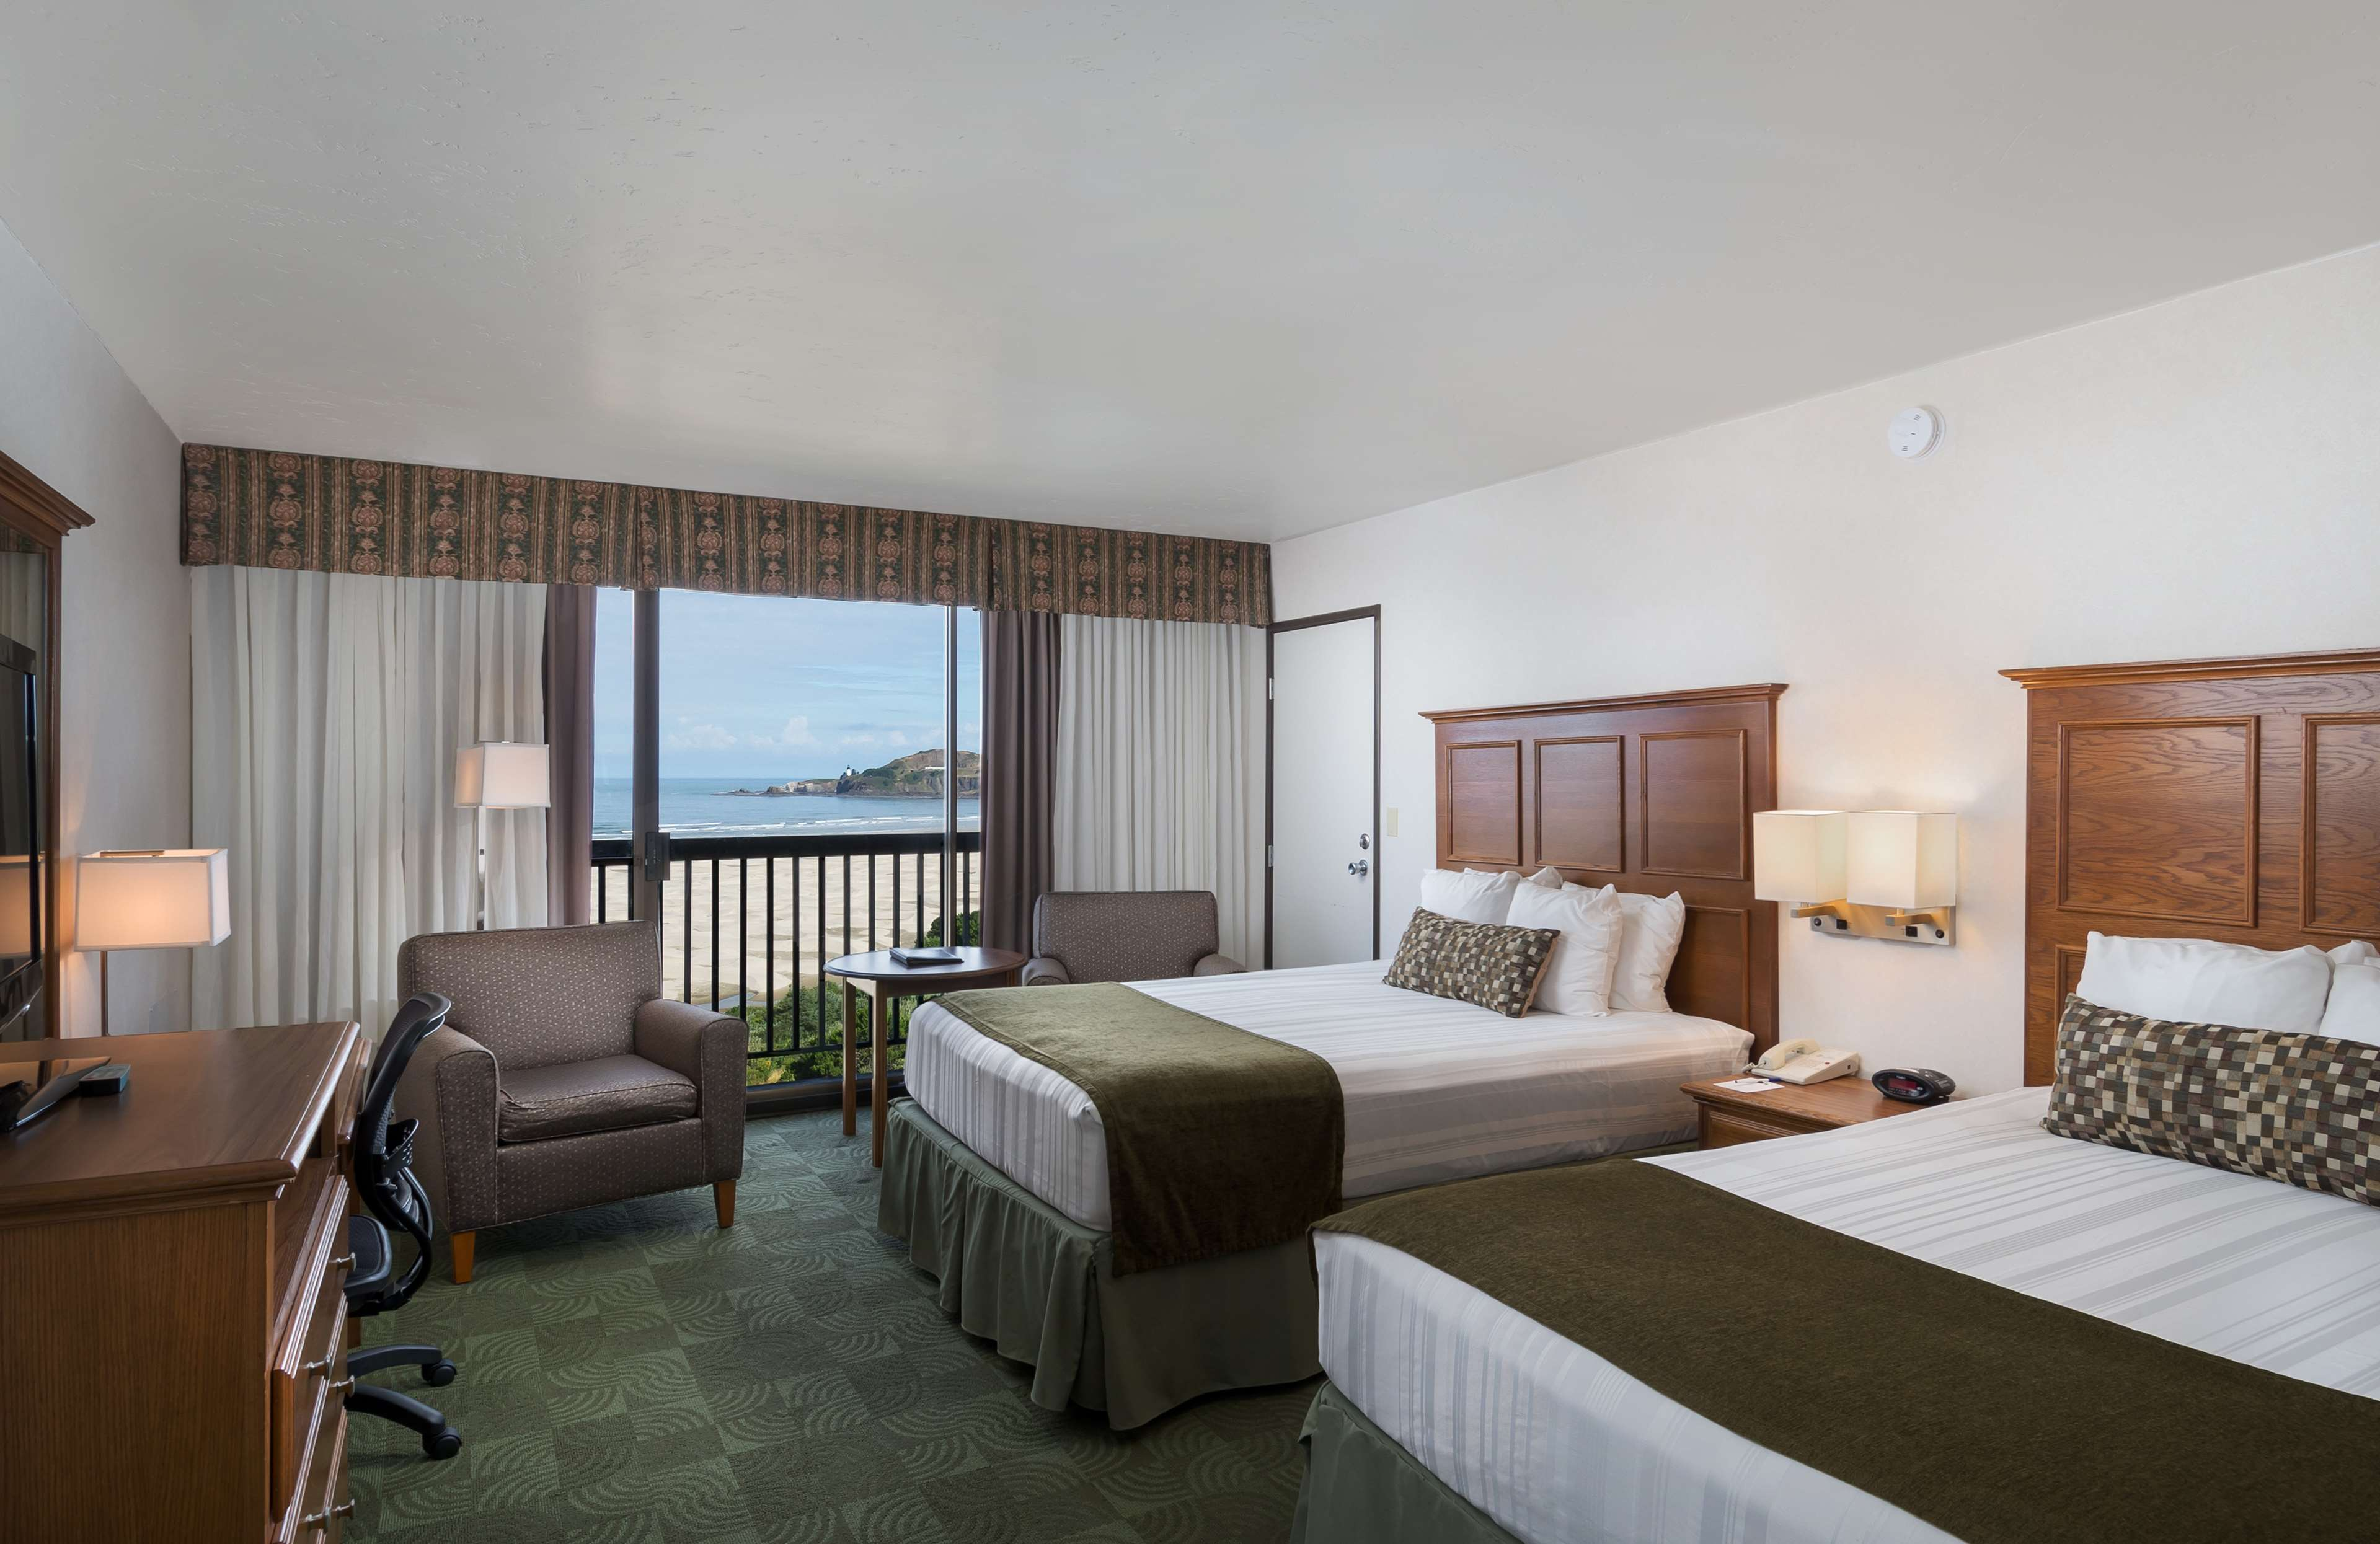 Best Western Agate Beach Inn image 4